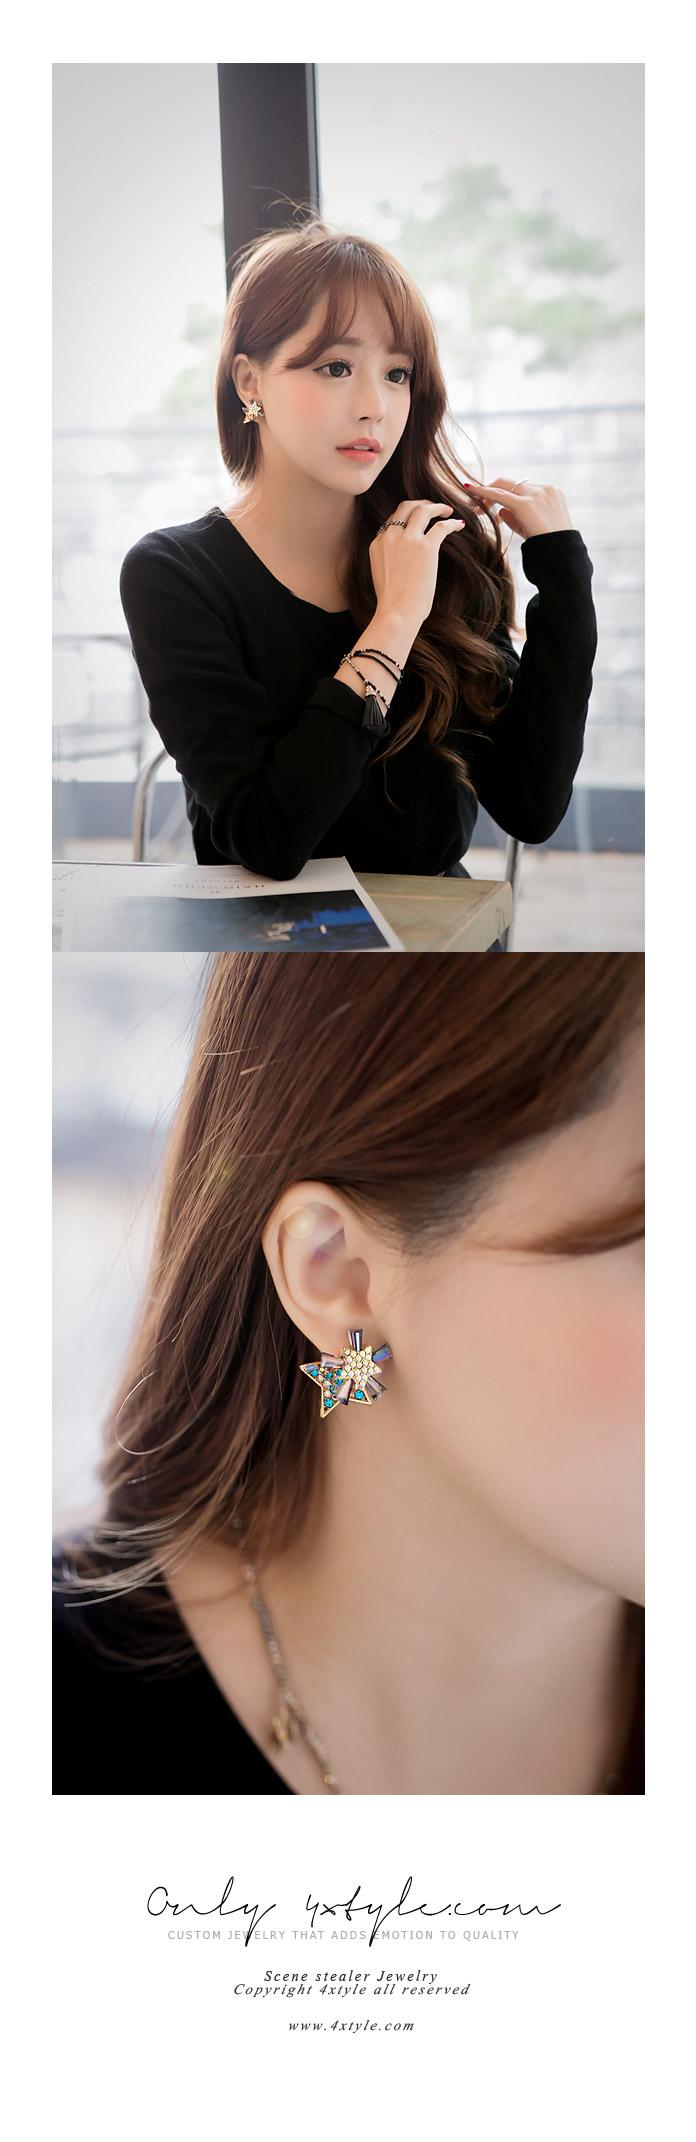 [ 4xtyle ] Starlight Twinkle Eariing, 3 Colors